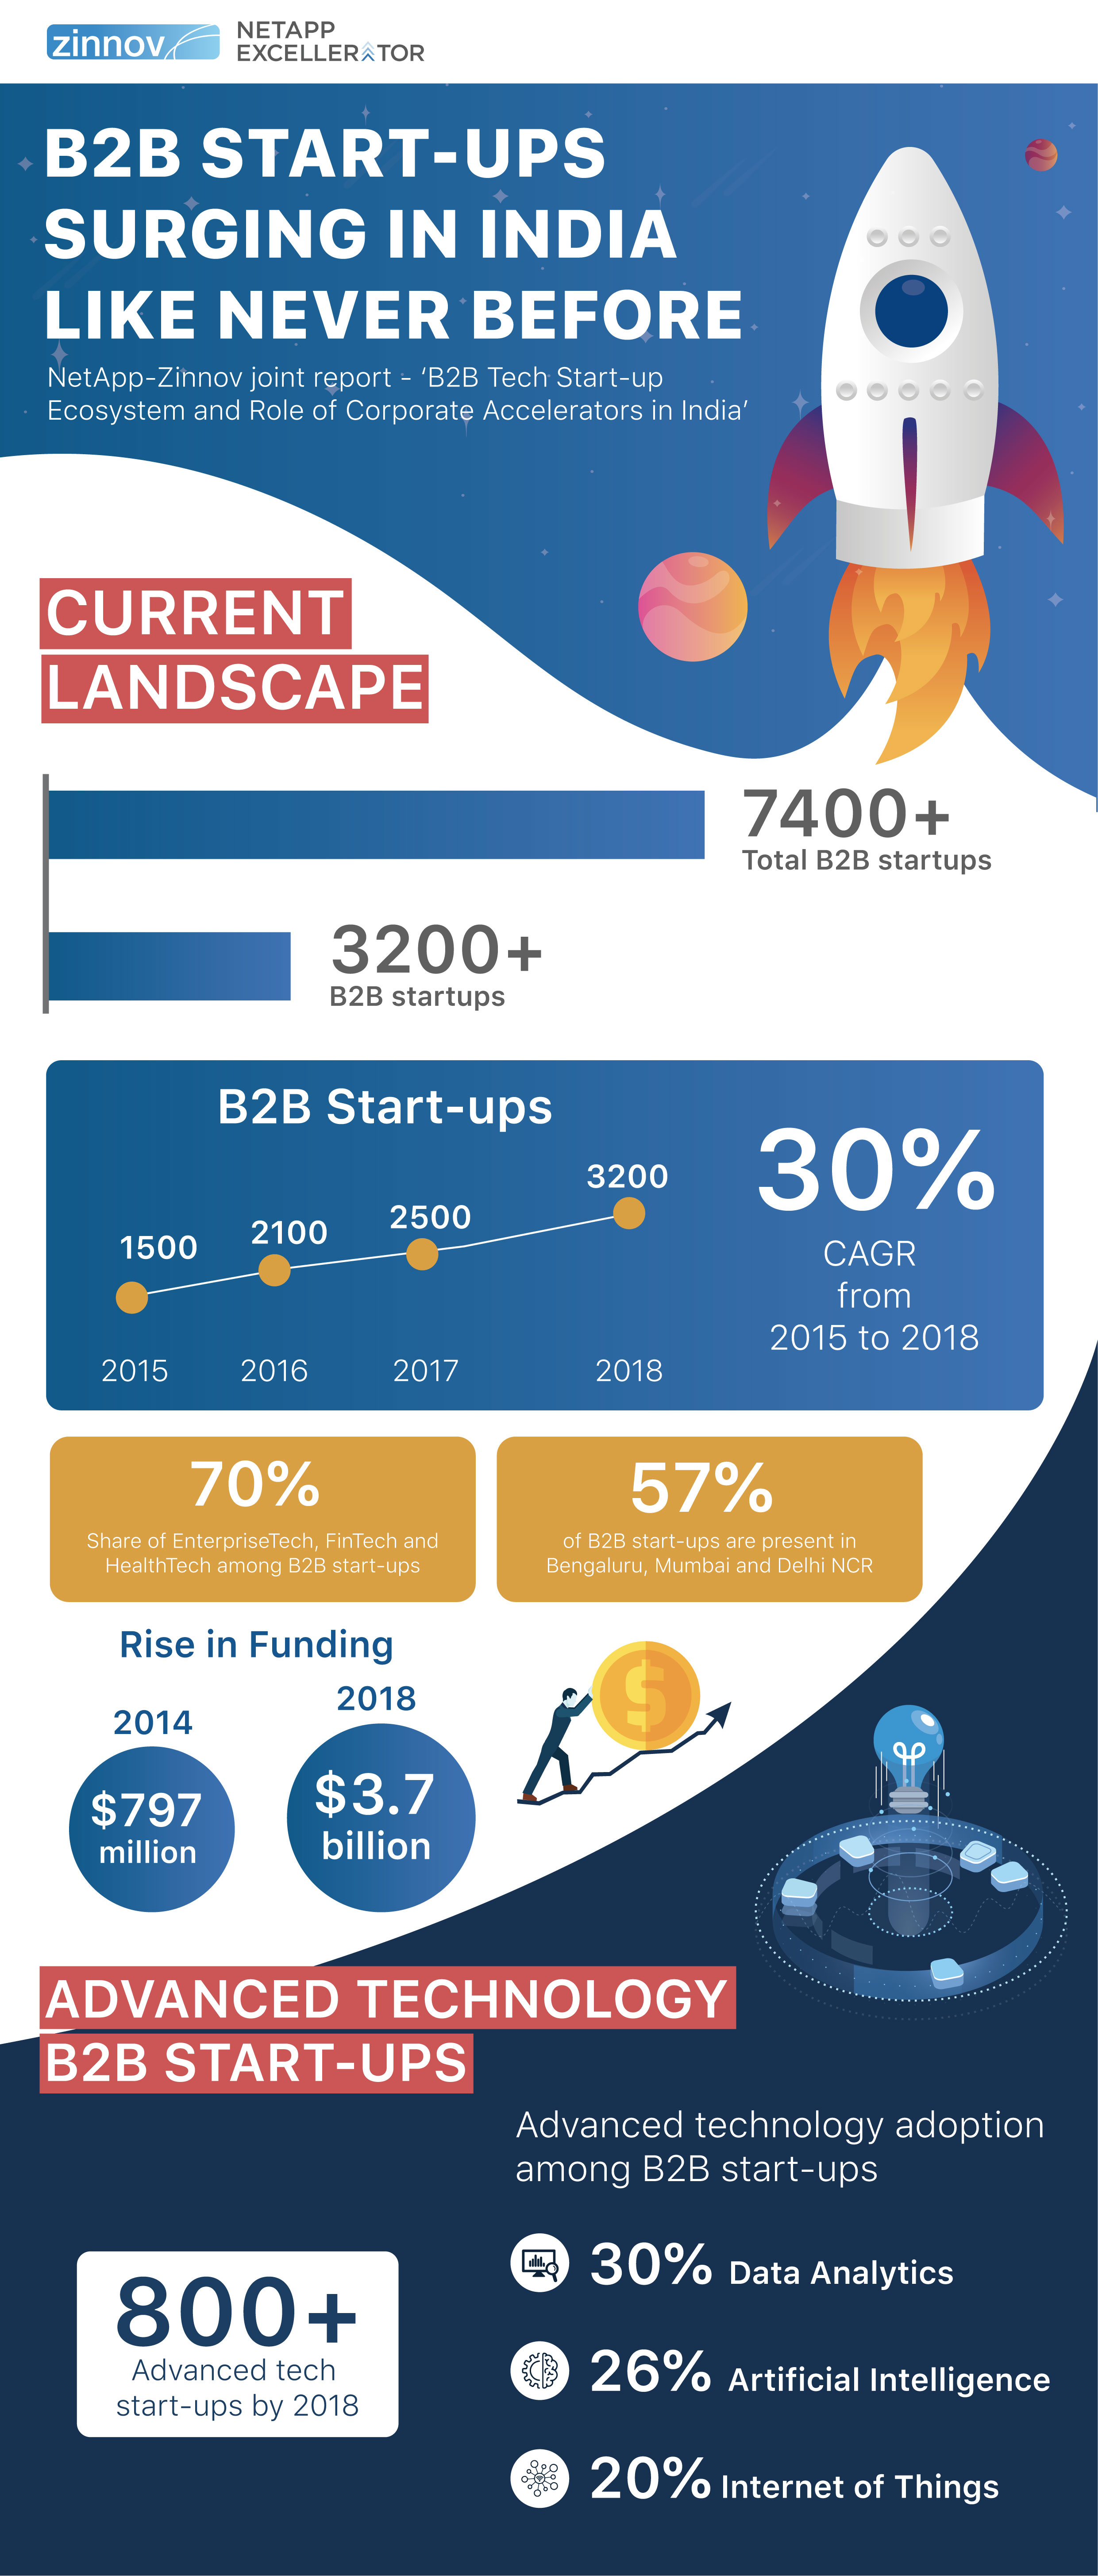 NetApp - Zinnov B2B Tech Startup Study